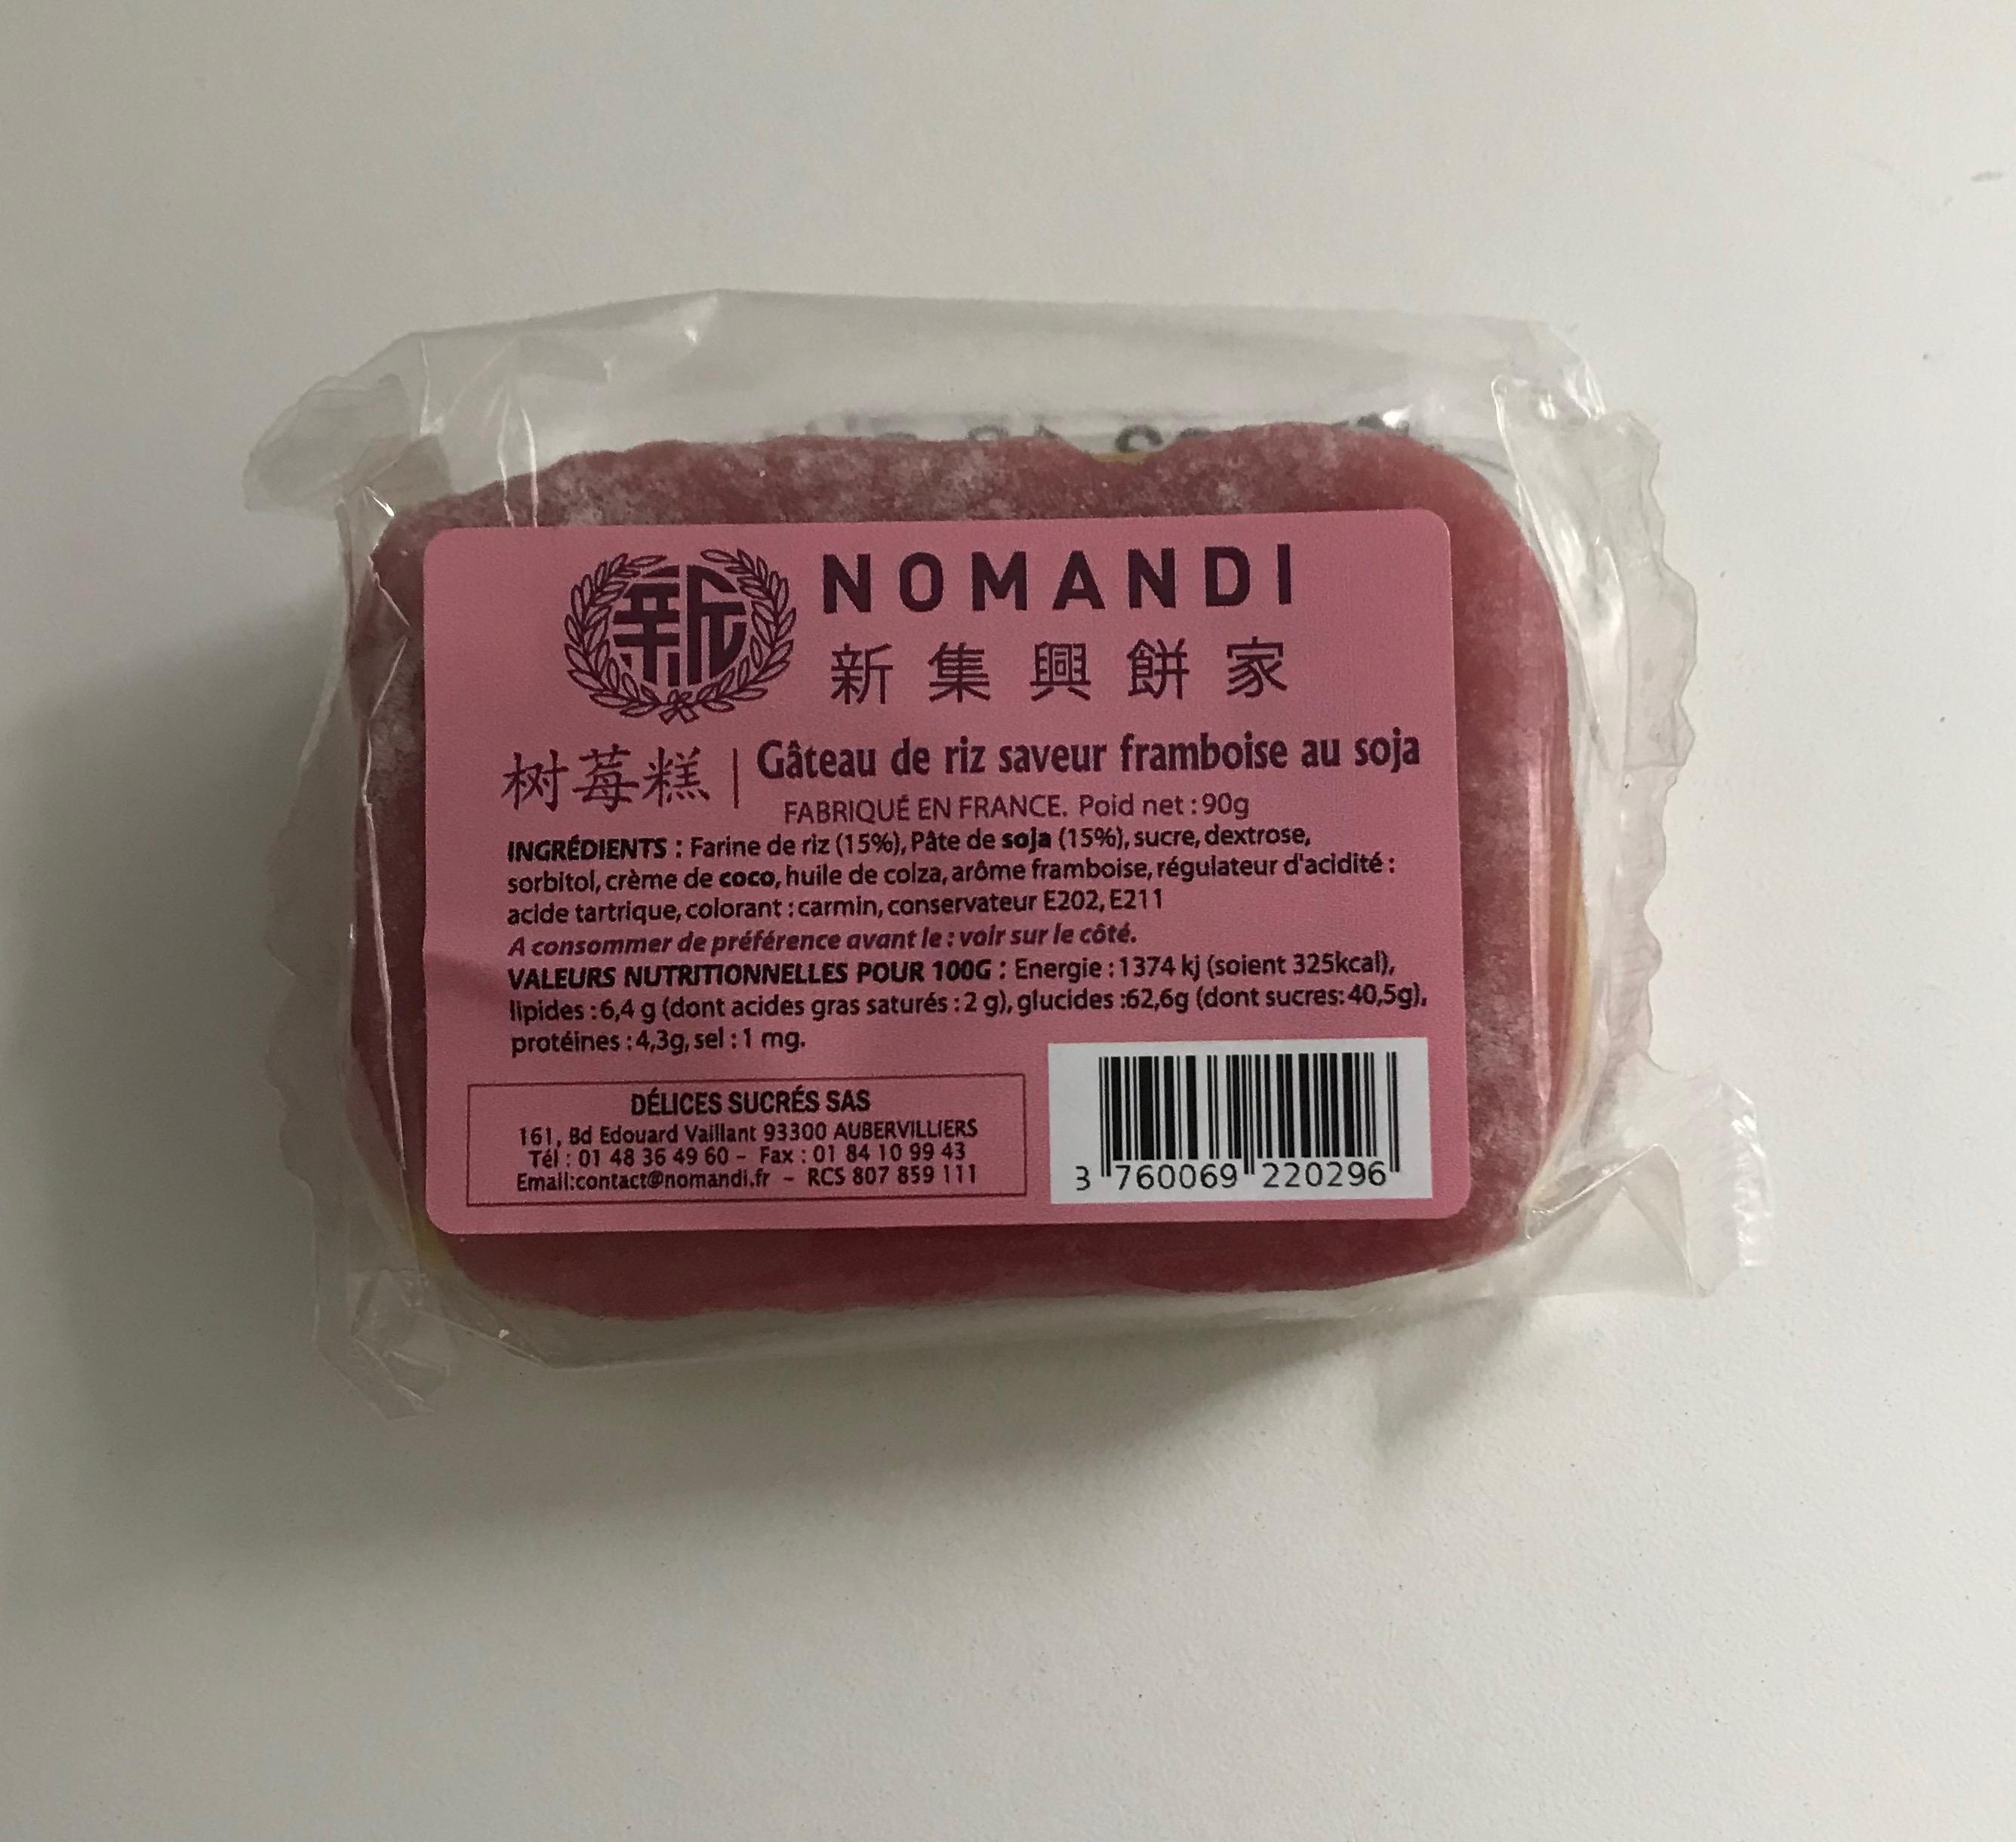 Gateau de riz saveur framboise au soja, Nomandi (90 g)